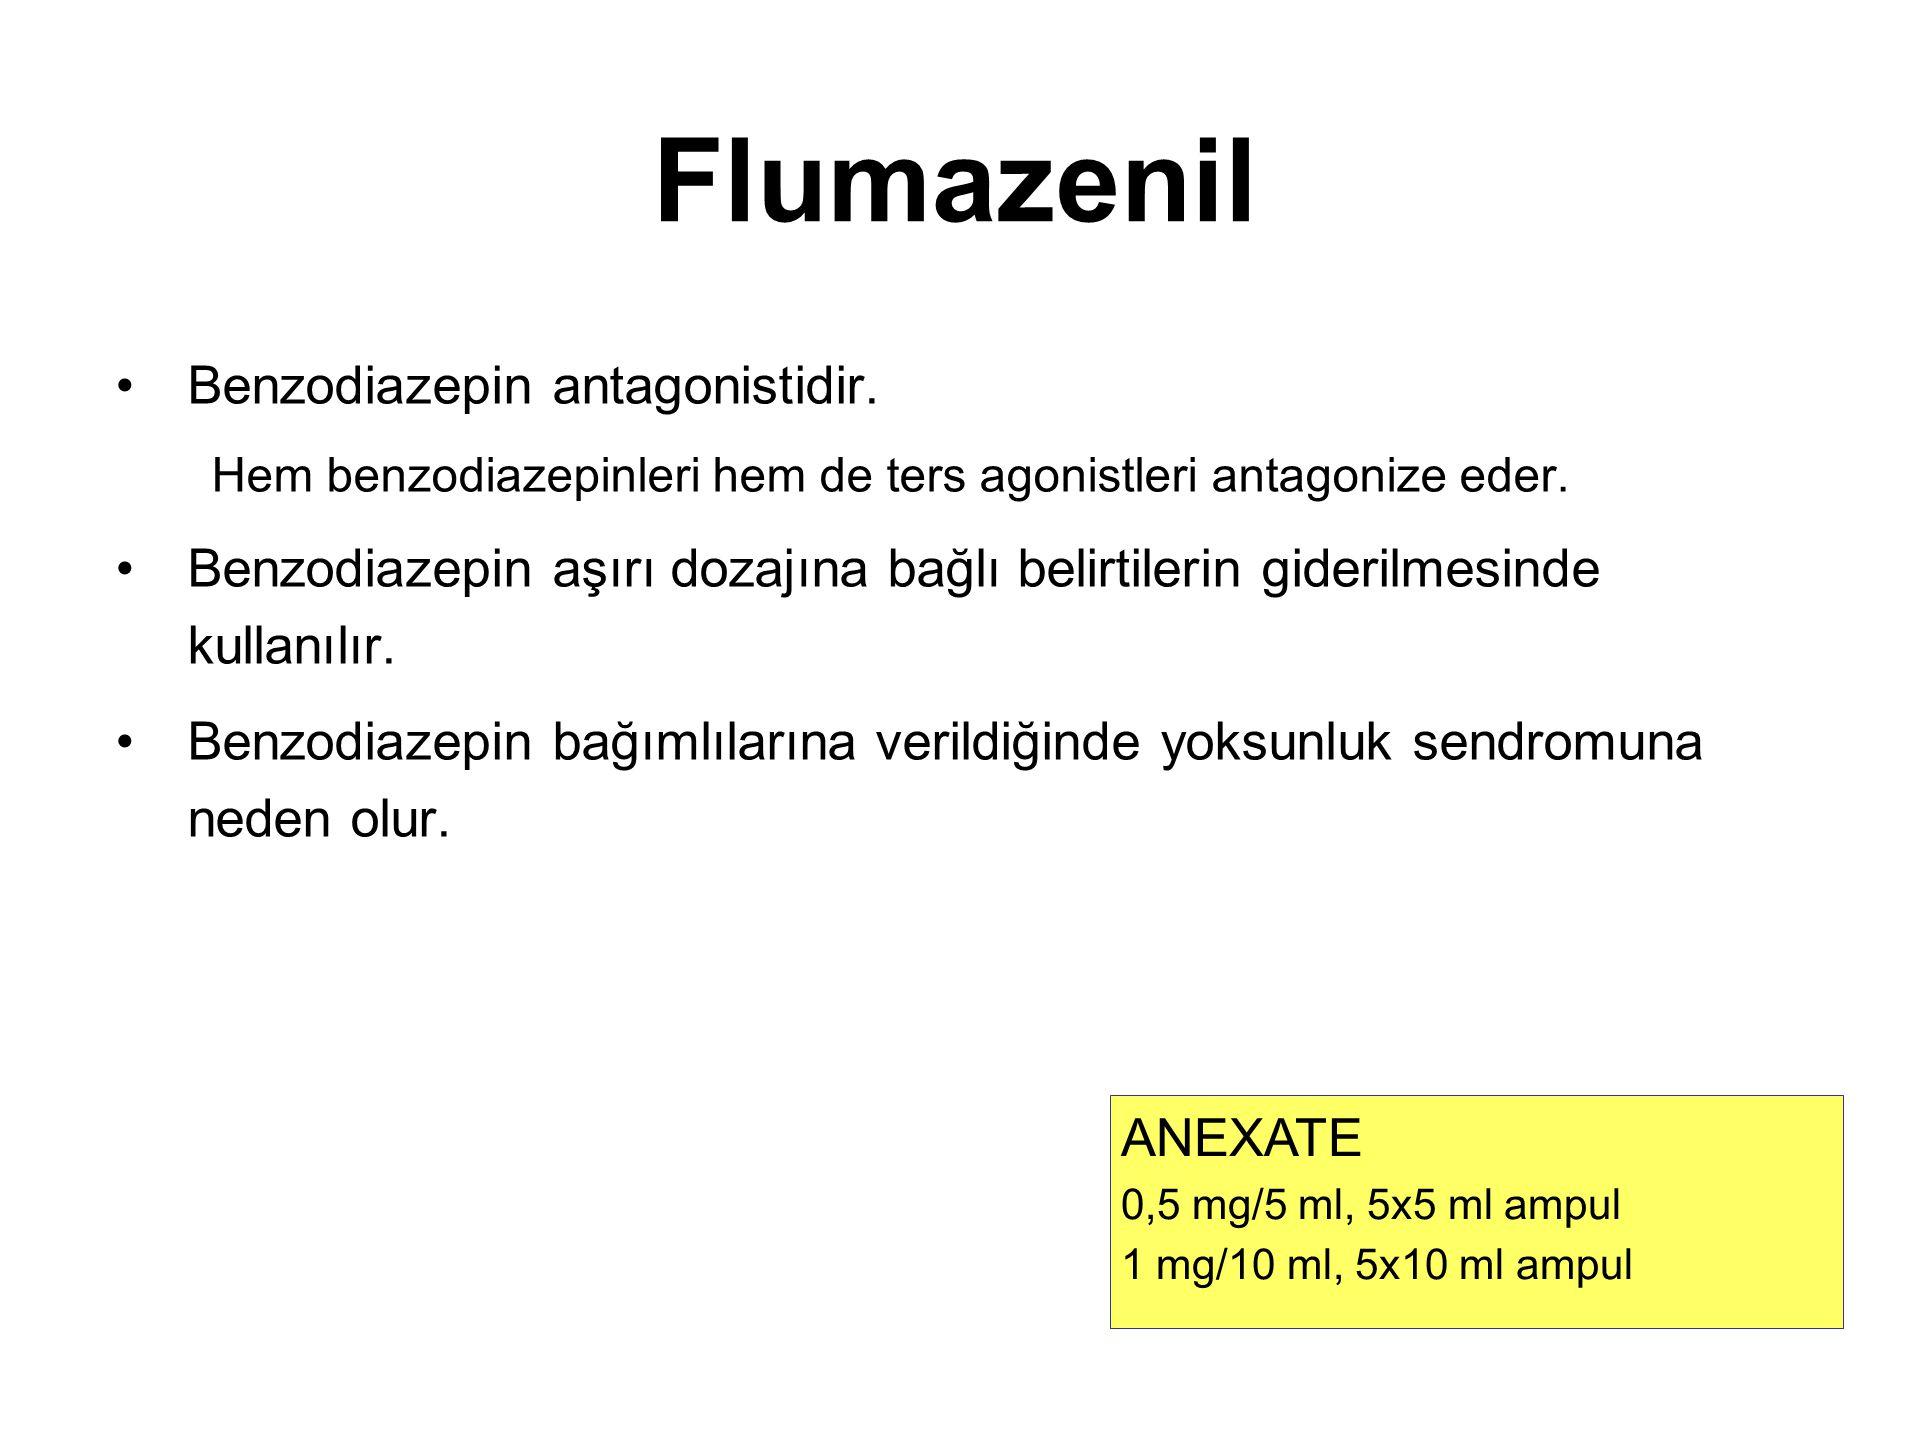 Spesiyaliteler Klorpromazin LARGACTİL 100 mg, 30 tablet 25 mg/5 ml, 10 ampul Haloperidol NORODOL 2 mg /ml, 20 ml damla 5 mg, 50 tablet 10 mg, 30 tablet 20 mg, 20 tablet 5 mg/ml, 5 ampul 10 mg/ml, 5 ampul Asepromazin PLEGİCİL 1 mg/10 damla, 30 ml Flupentiksol FLUANXOL 3 mg, 50 tablet 20 mg/ml, 1 depo ampul Melperon BURONON 25 mg, 50 draje 100 mg, 30 draje 50 mg, 5 ampul Pimozid NÖROFREN 2 mg, 30 tablet Tioridazin MELLERETTES 10 mg, 30 draje 30 mg/ml, 30 ml damla MELLERİL 25 mg ve 100 mg, 30 draje Mezoridazin LİDANİL 5 mg, 20 draje Trifluoperazin STİLİZAN 1 mg/ml, 5 ampul 1 mg, 2 mg ve 5 mg 30 draje